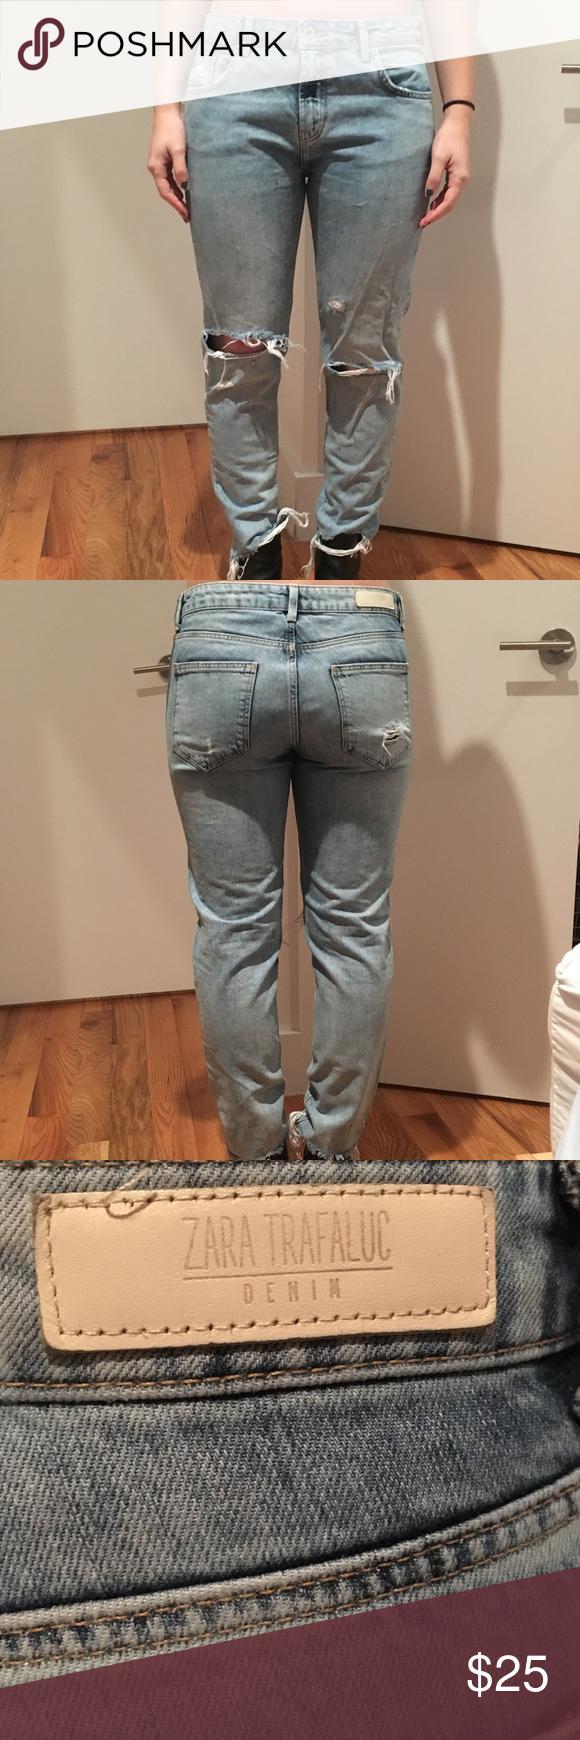 92493311 Zara Trafaluc girlfriend jeans, size 4 (Euro 36) Zara Trafaluc denim  girlfriend jeans Size 4 (European 36) Distressed, lightwash Zara Jeans  Boyfriend